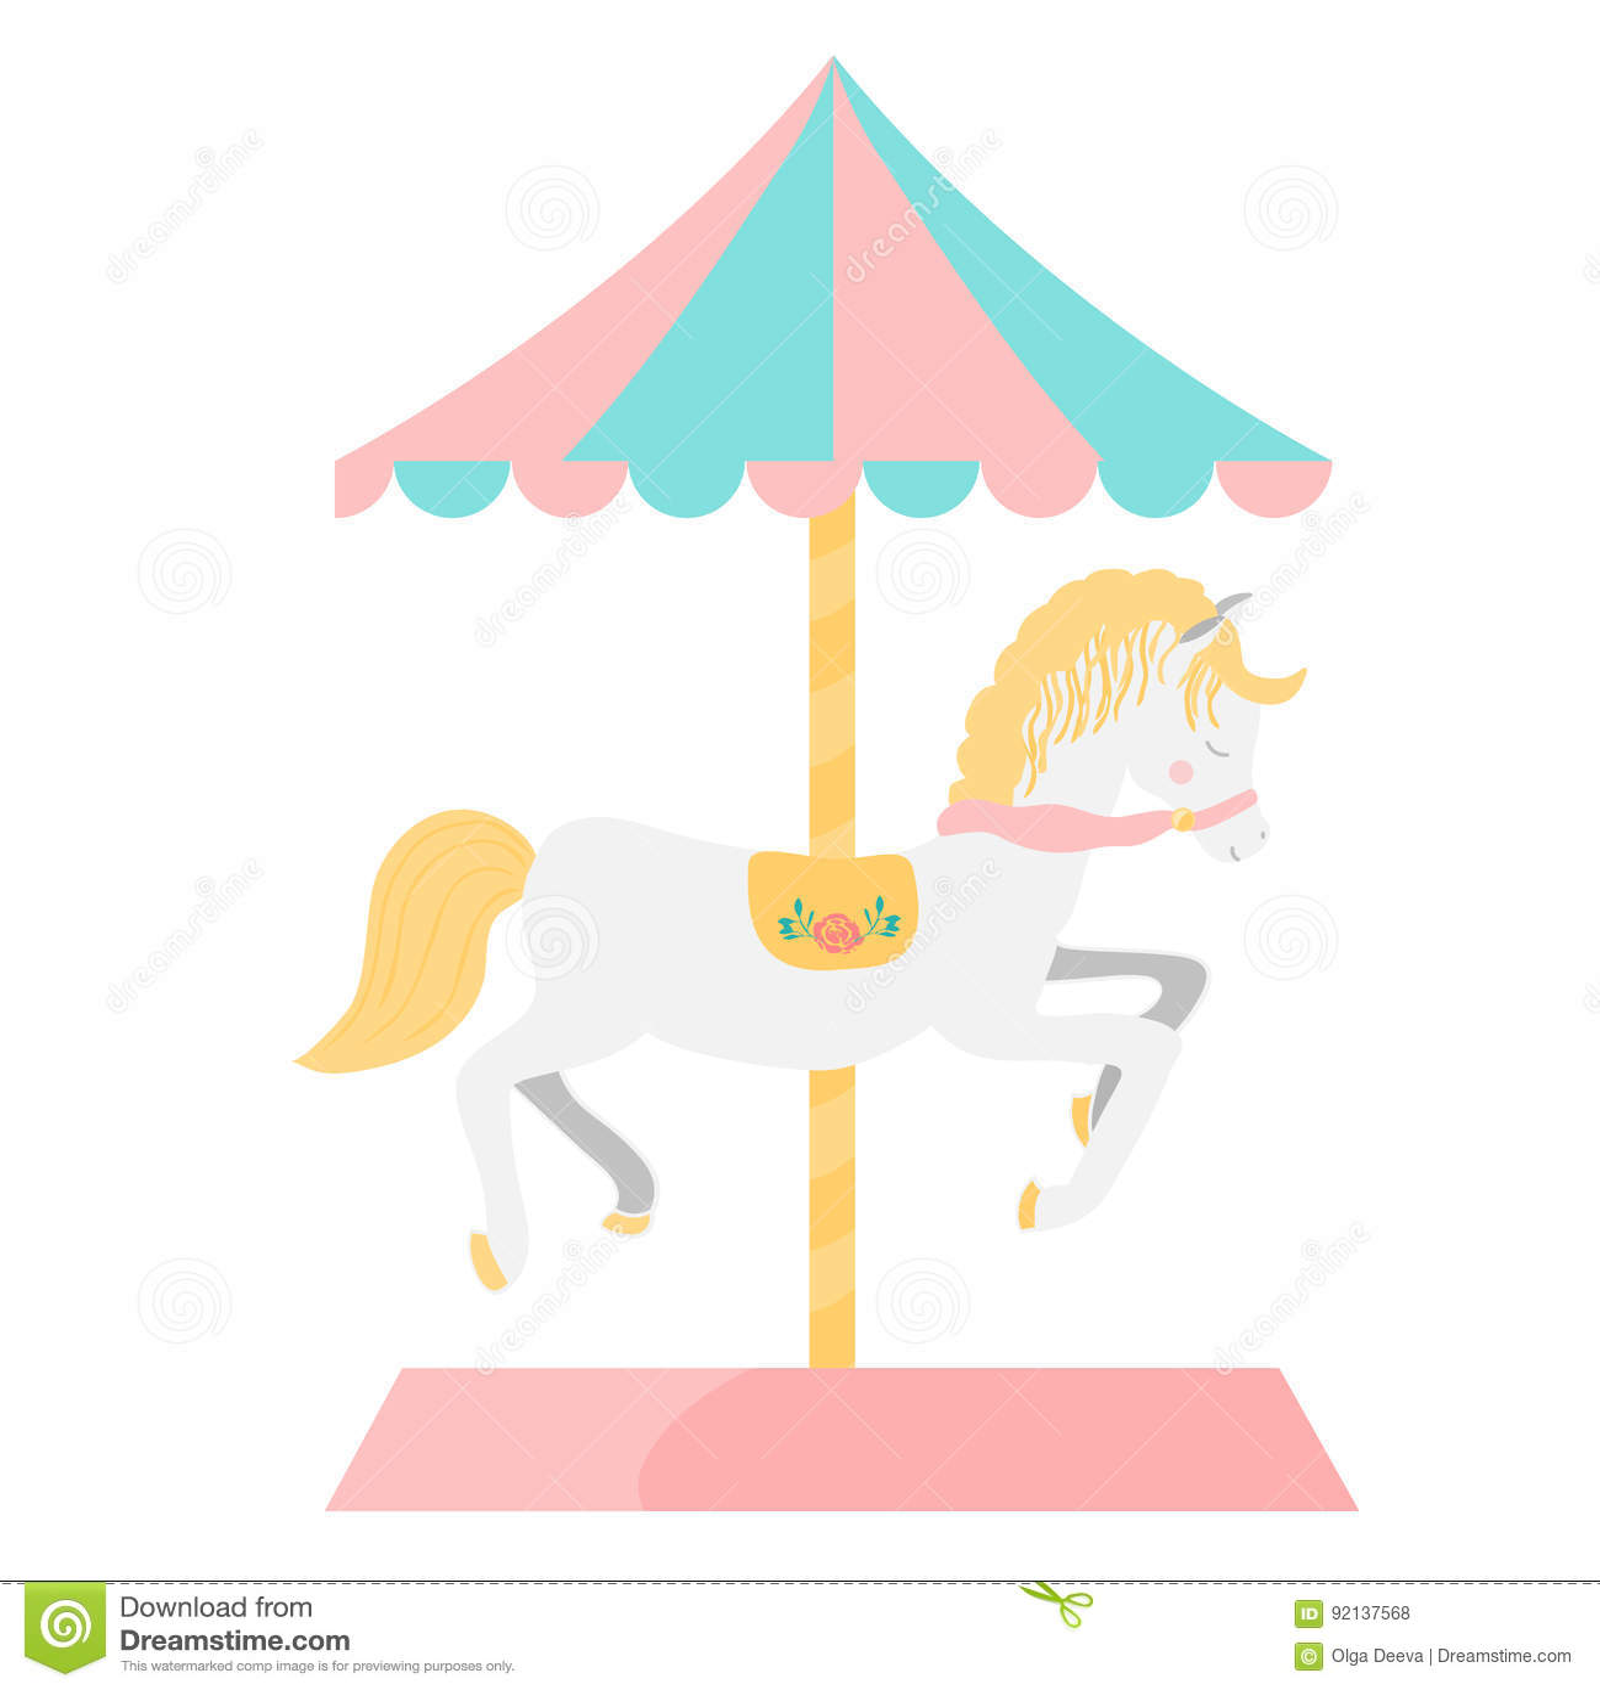 Carousel Horse Illustration Stock Vector Illustration Of Product Festival 92137568